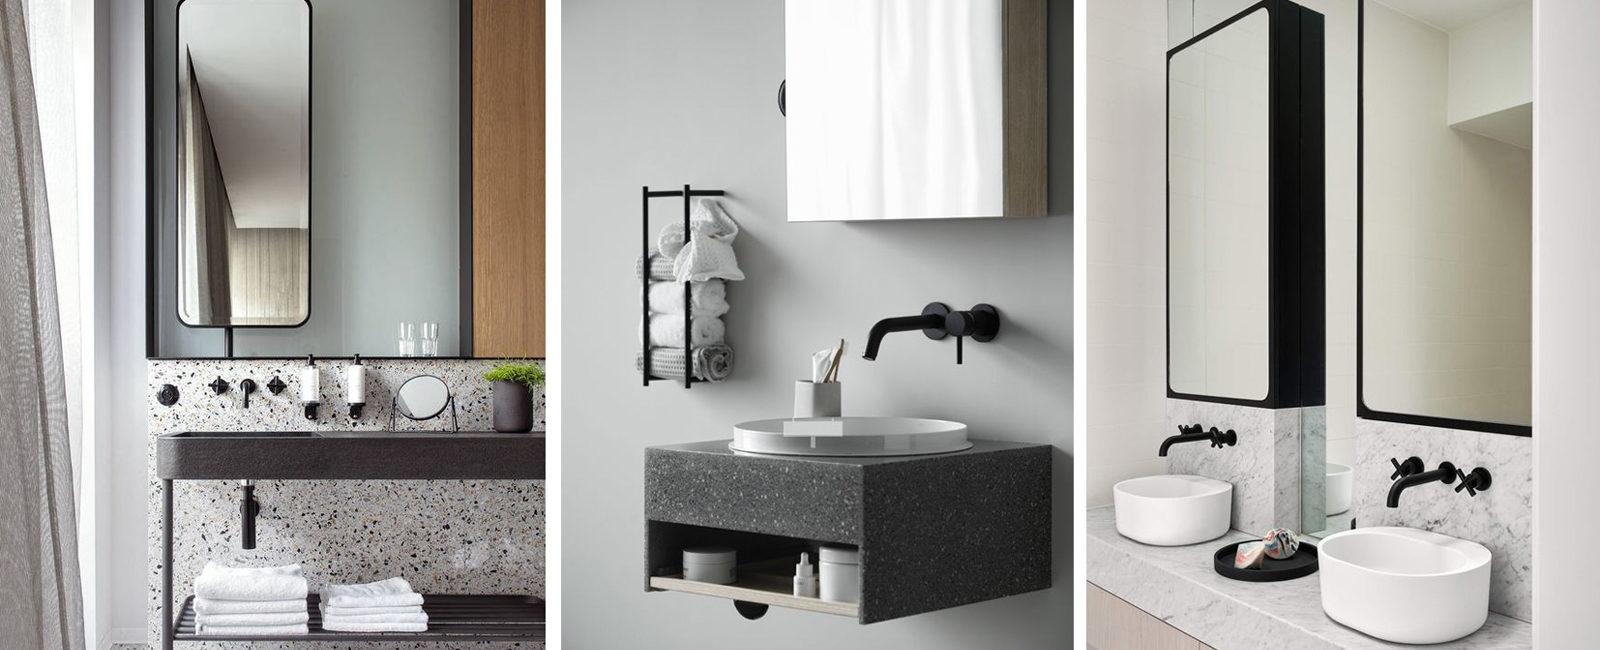 Interior notes my notes on interior design and decoration - Rubinetteria bagno nera ...